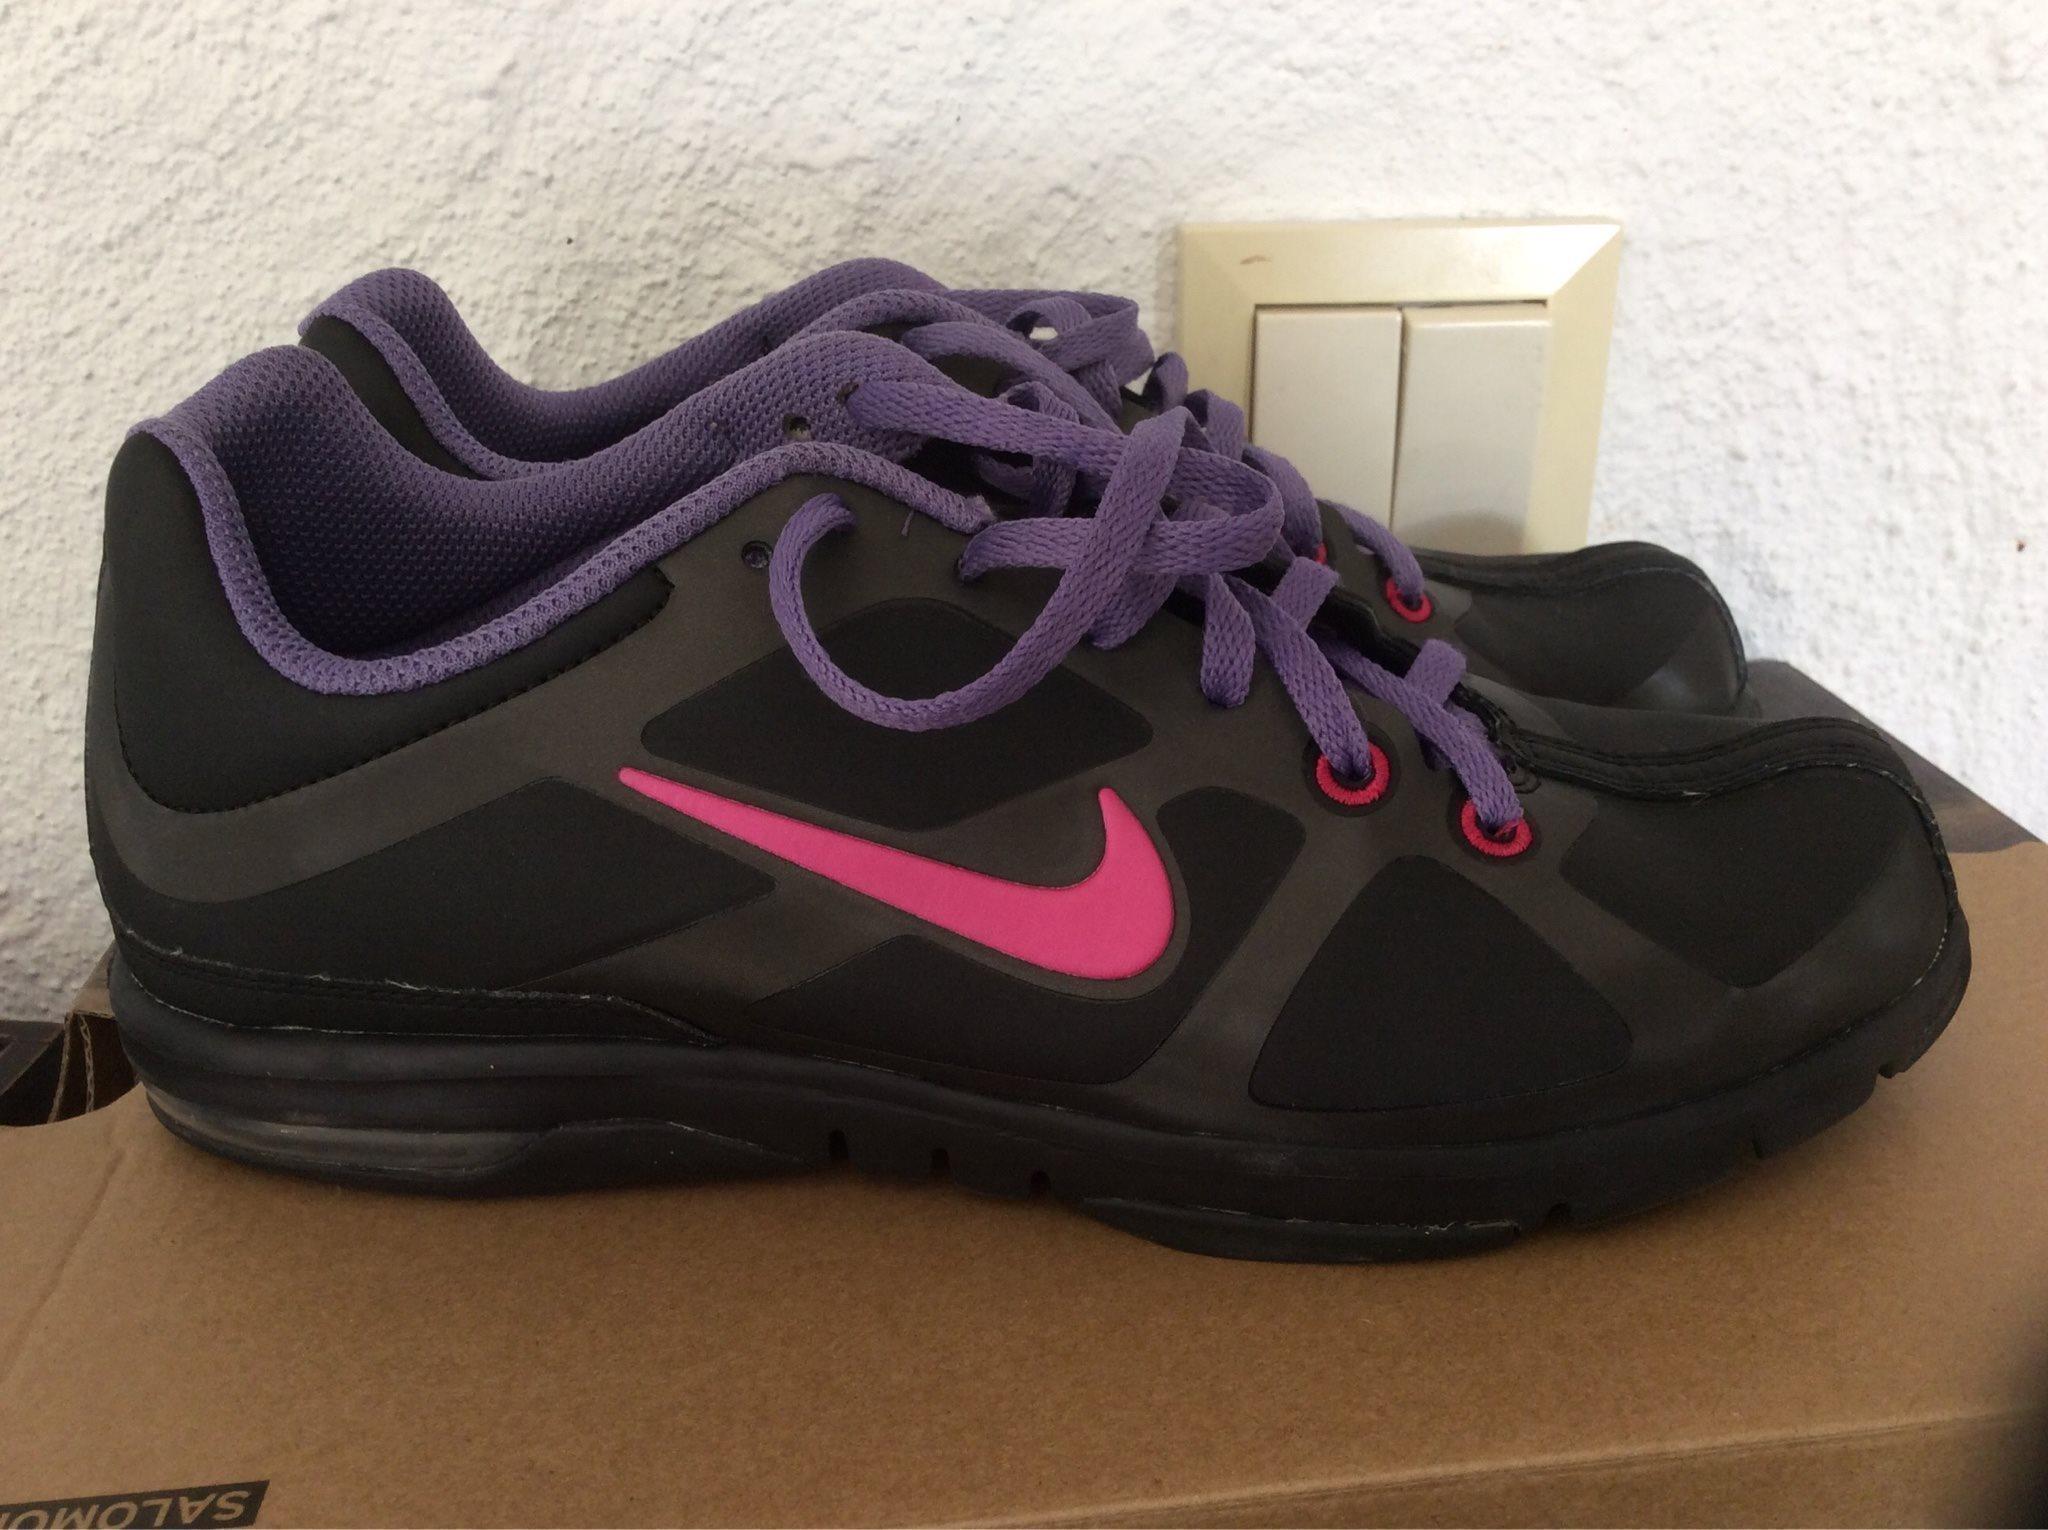 new concept 01bd6 44b8c Nike Air Max skor i storlek 38. Nyskick!